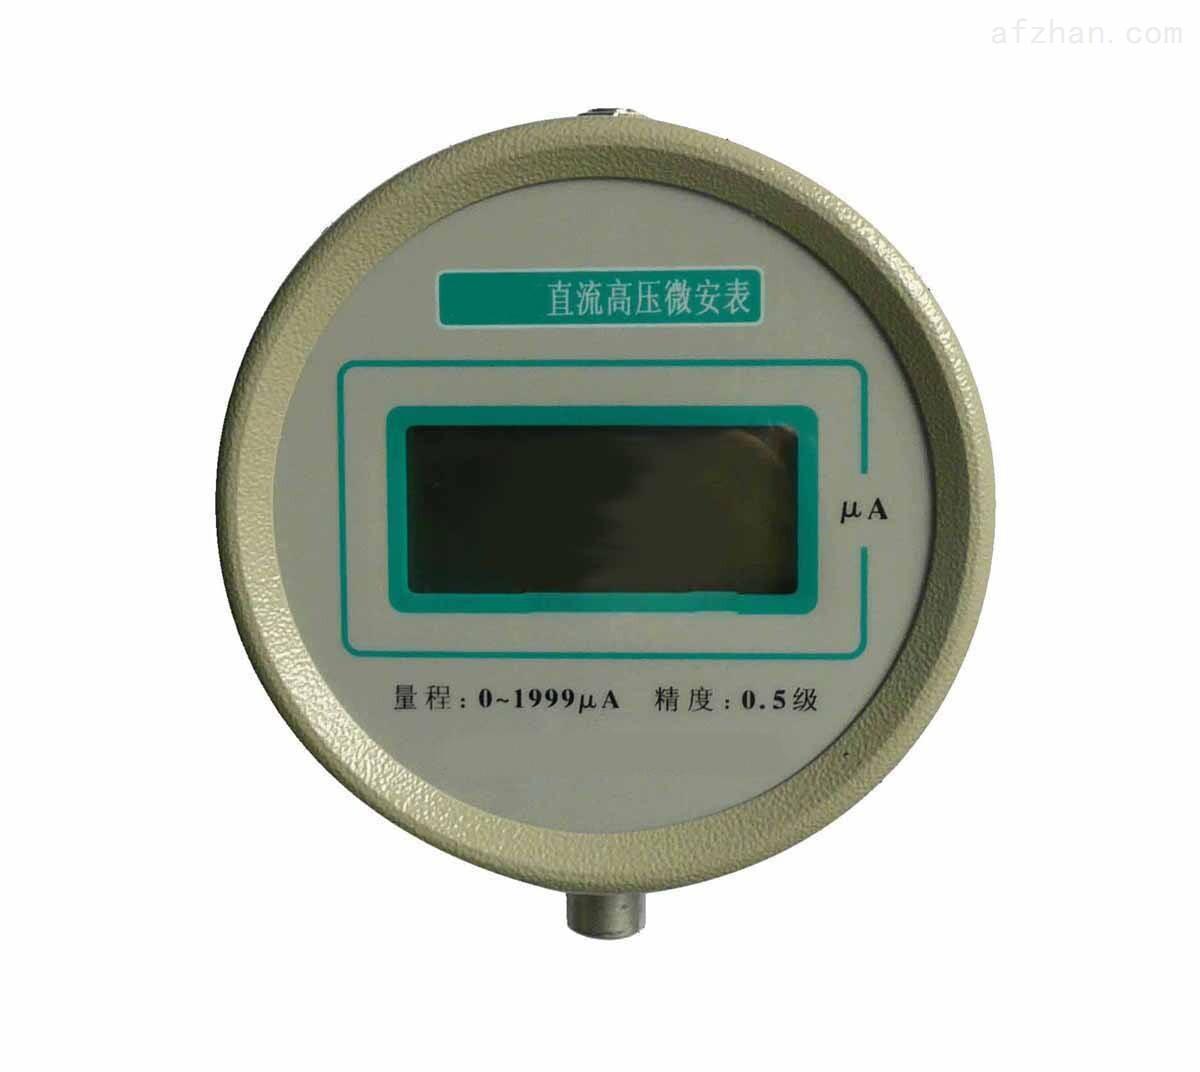 swb-iv高压数显微安表